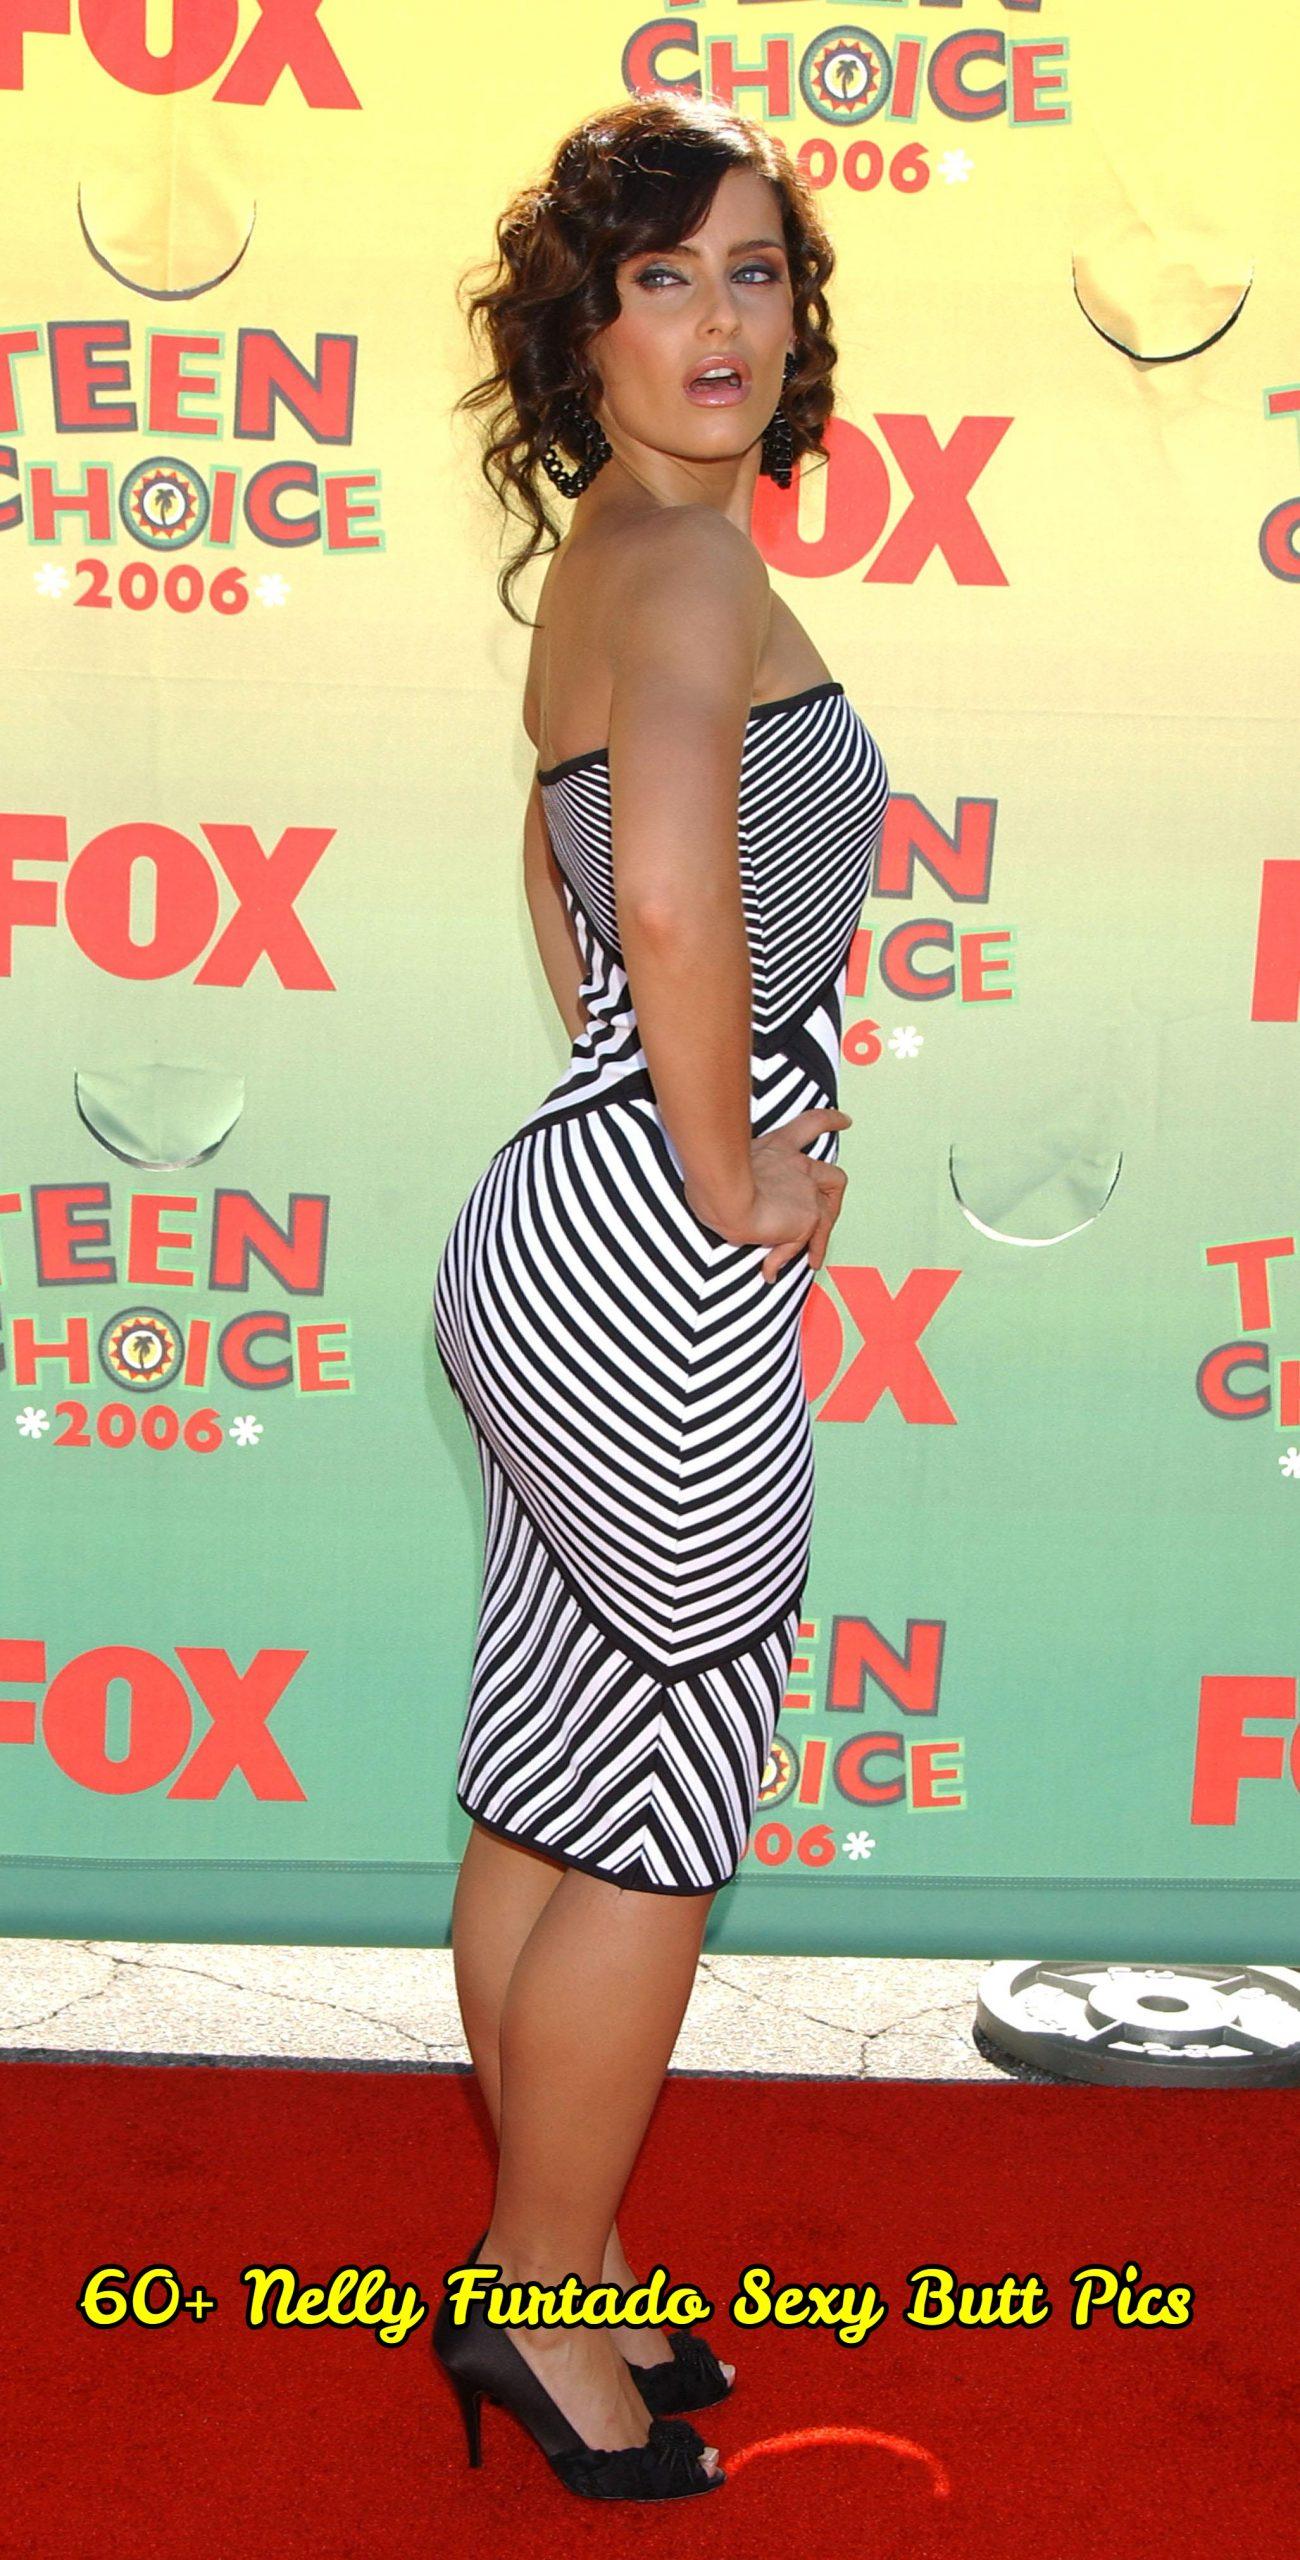 Nelly Furtado sexy butt pics